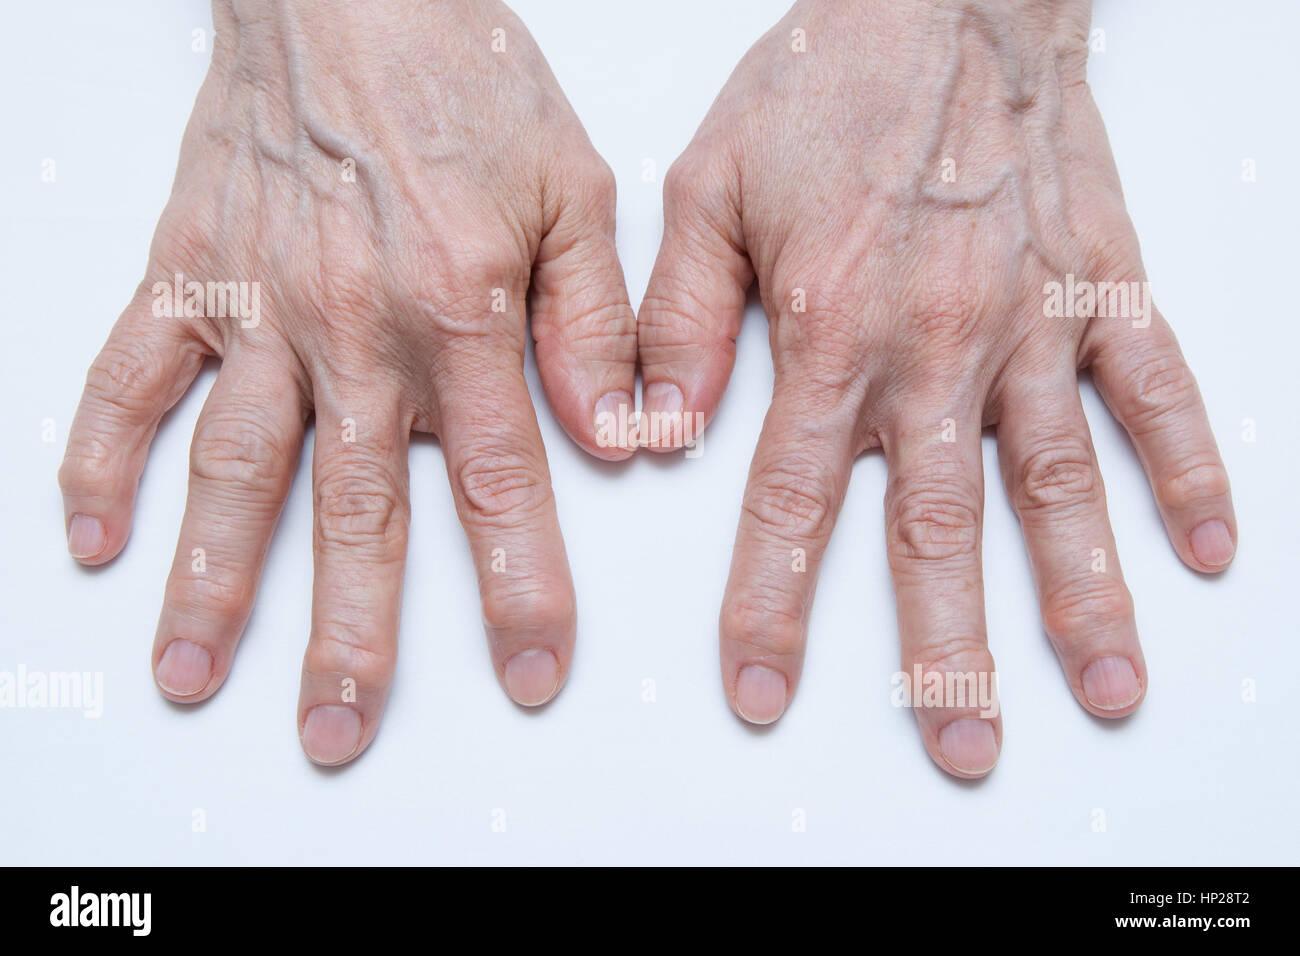 Bilateral Osteoarthritis